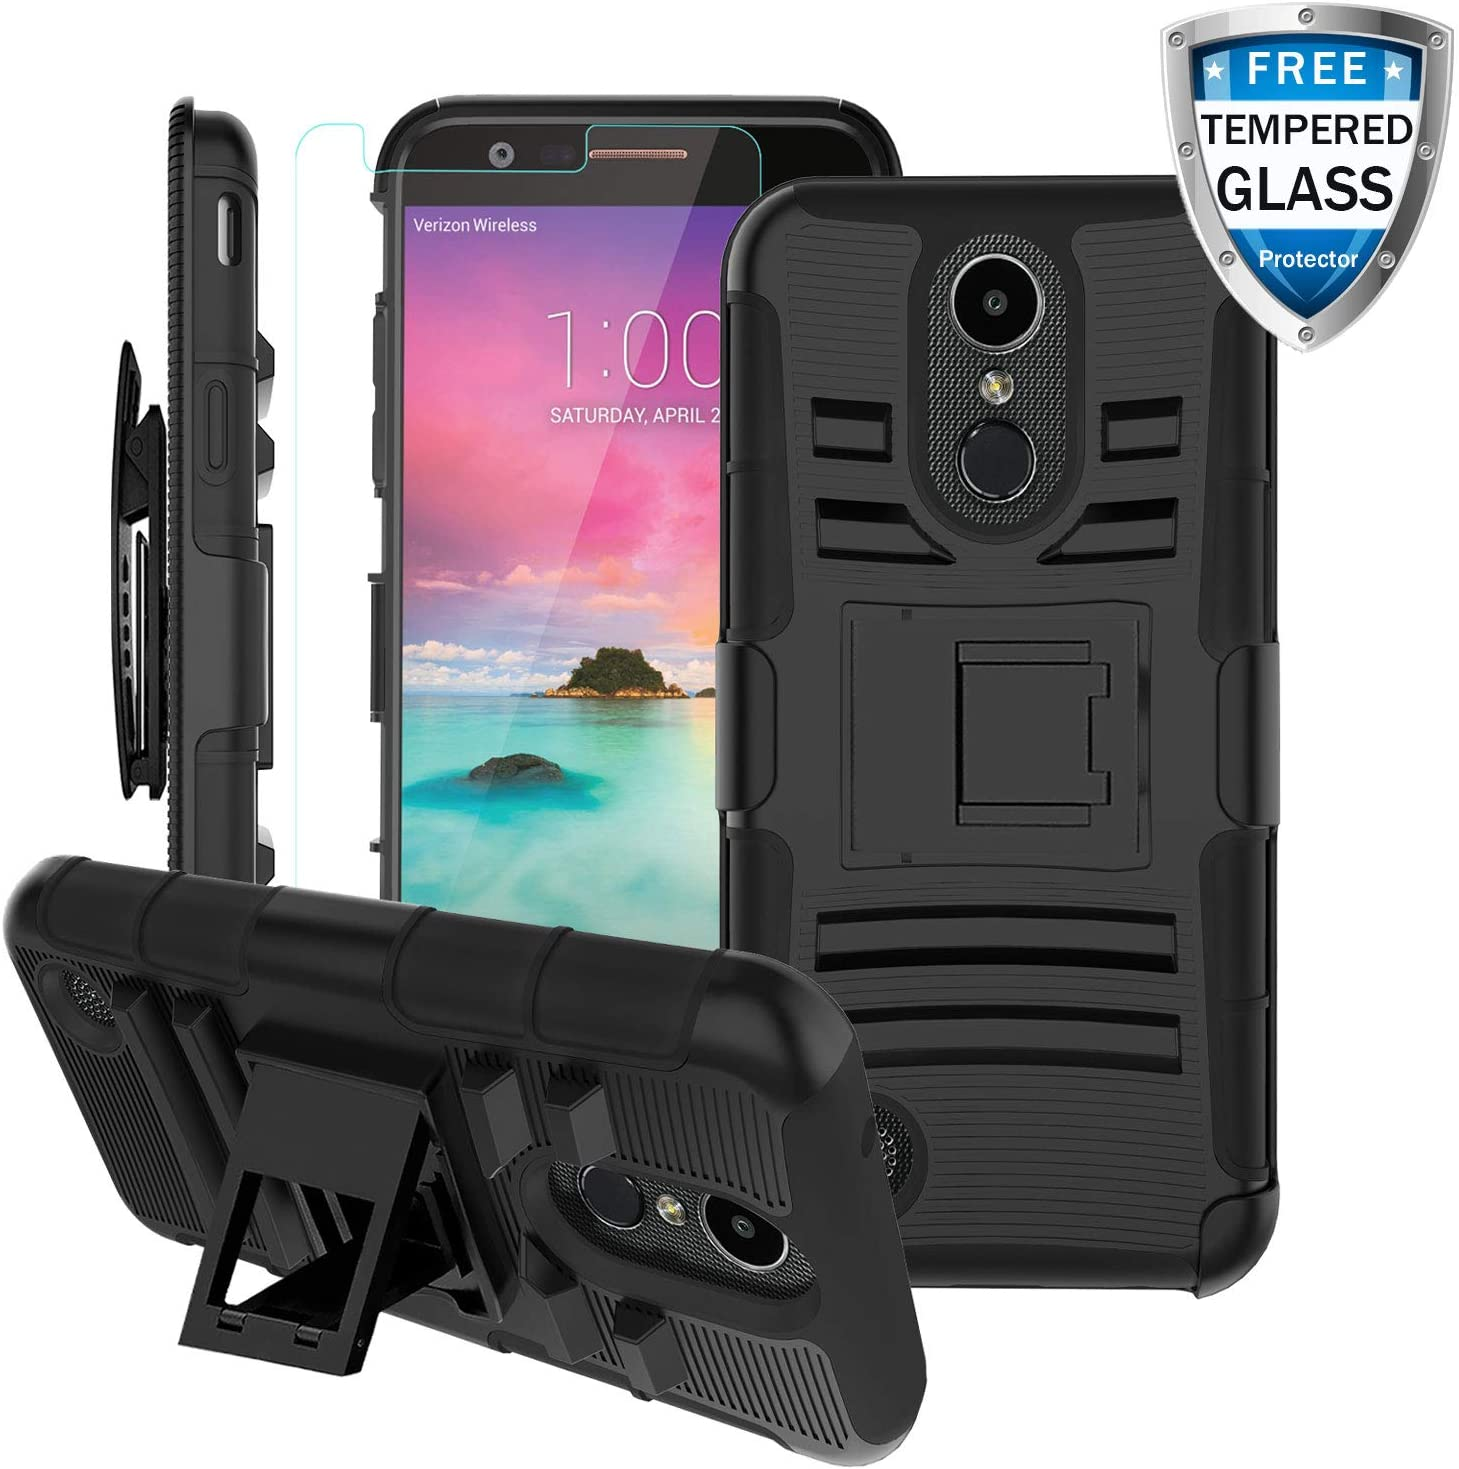 BEBEST-LG K20 Plus Case, LG K20 V/LG Harmony/K10 2017/LV5 /VS501/LG Grace LTE Phone Case w/Screen Protector&Kickstand&Belt Clip[Shockproof Bumper] Rugged Heavy Duty Full Body Protective Cover-Black